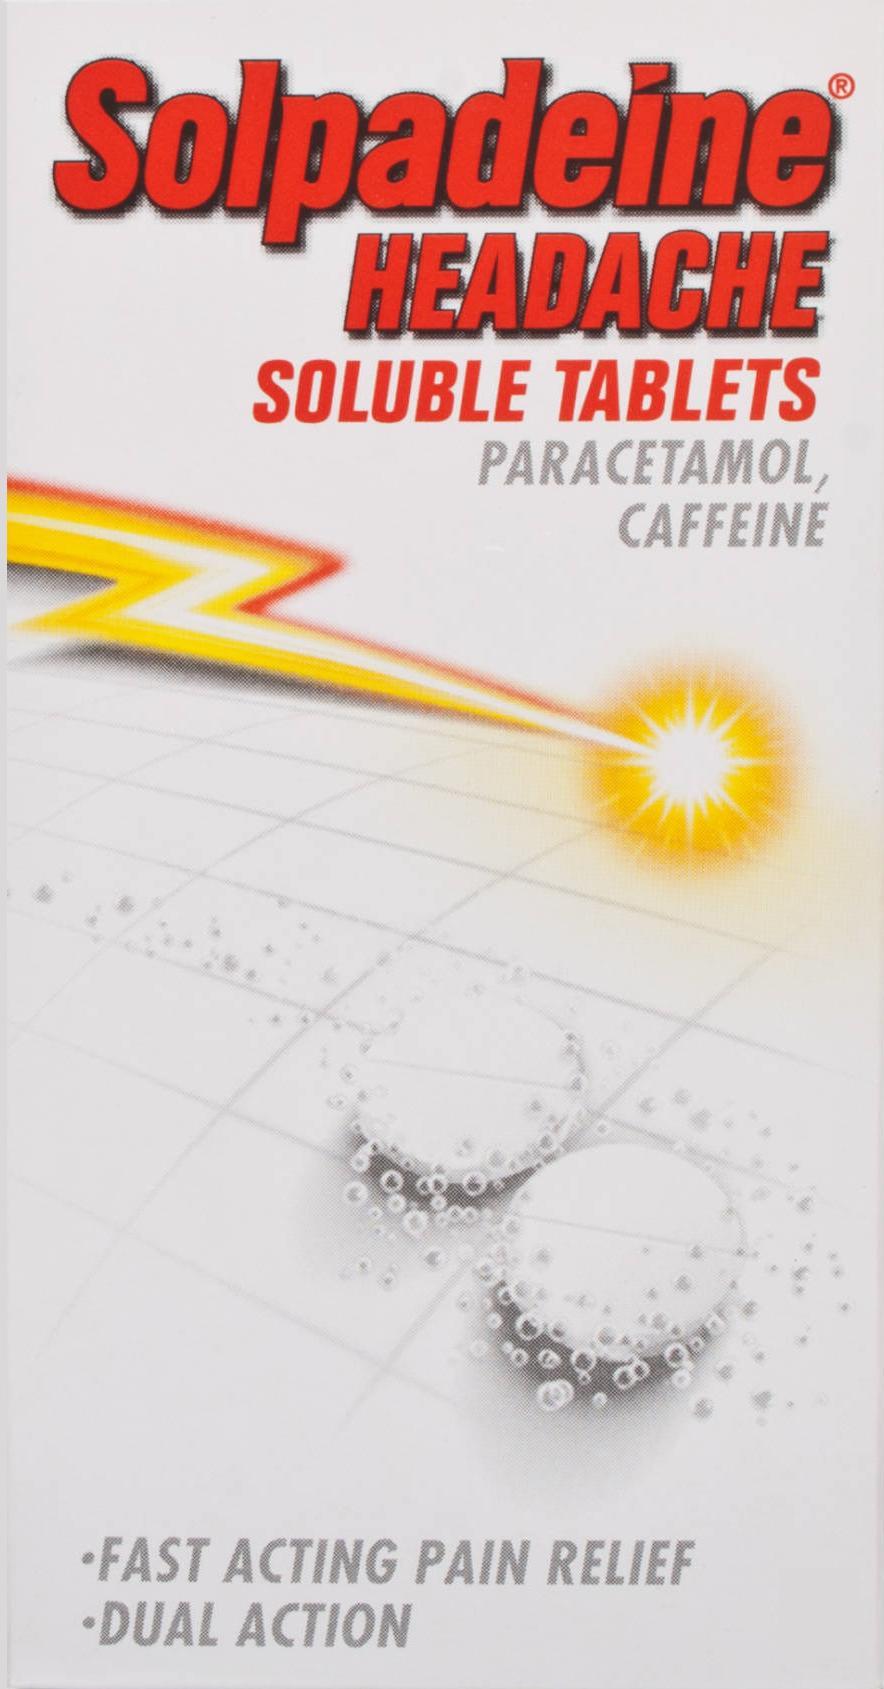 Solpadeine Headache Soluble Tablets